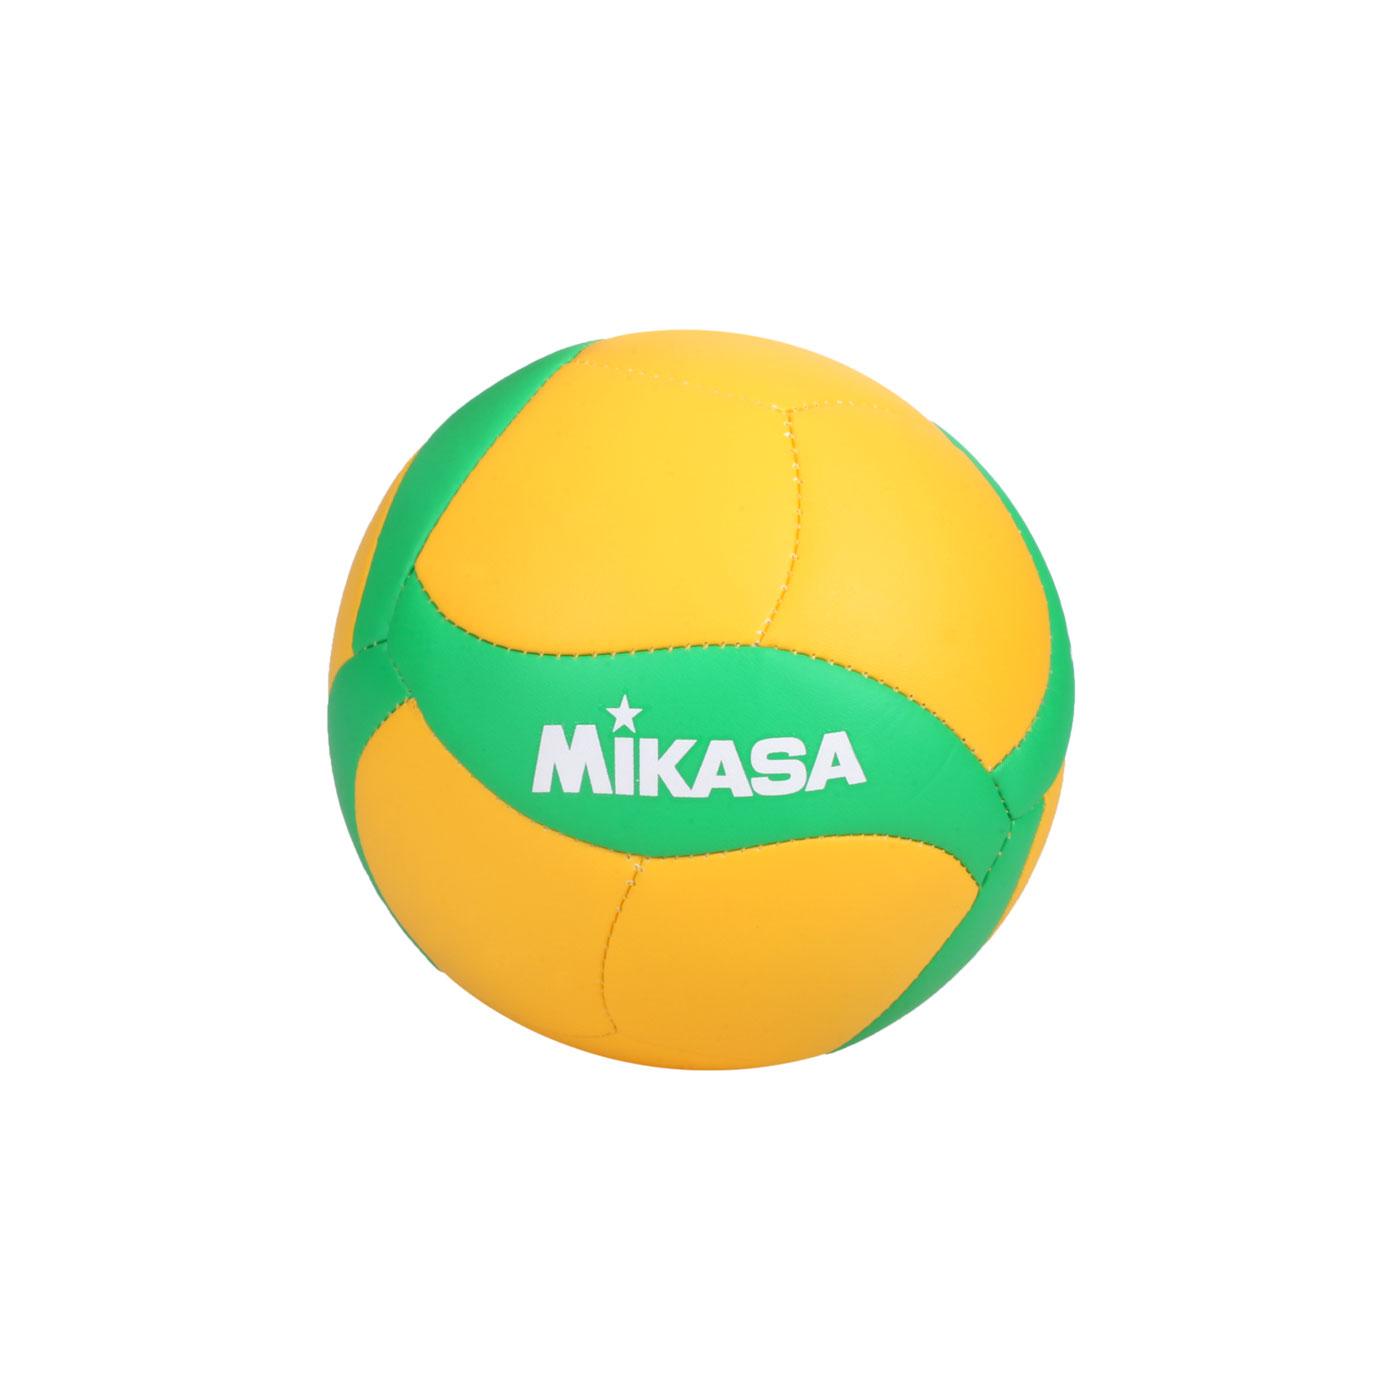 MIKASA 歐冠杯紀念排球#1.5 MKV15W-CEV